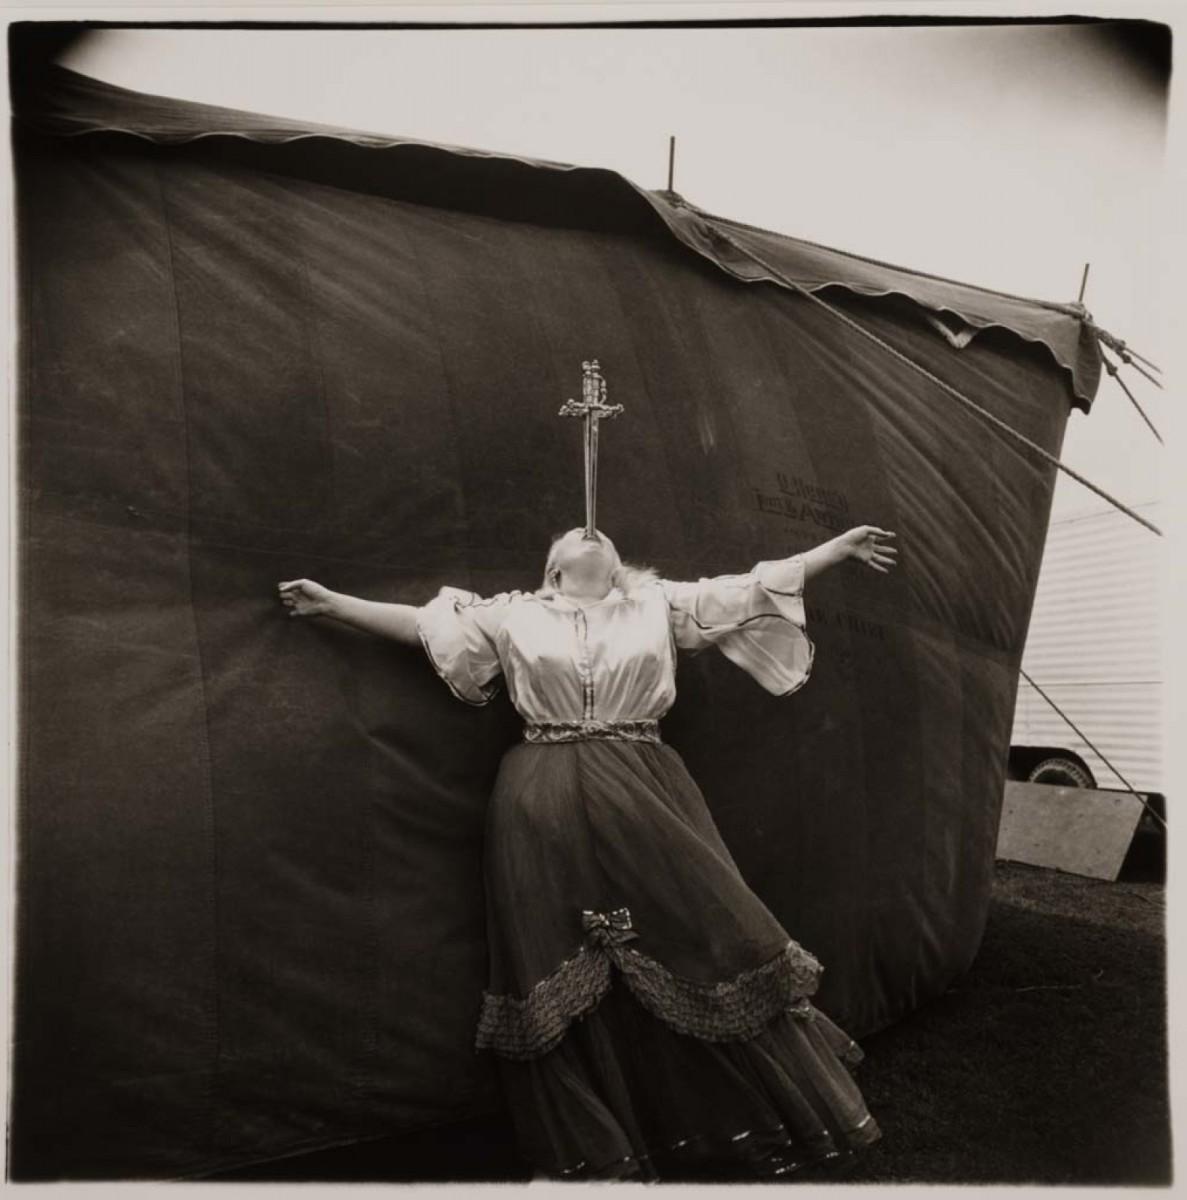 Diane Arbus, Albino Sword Swallower at a Carnival, MD. 1970